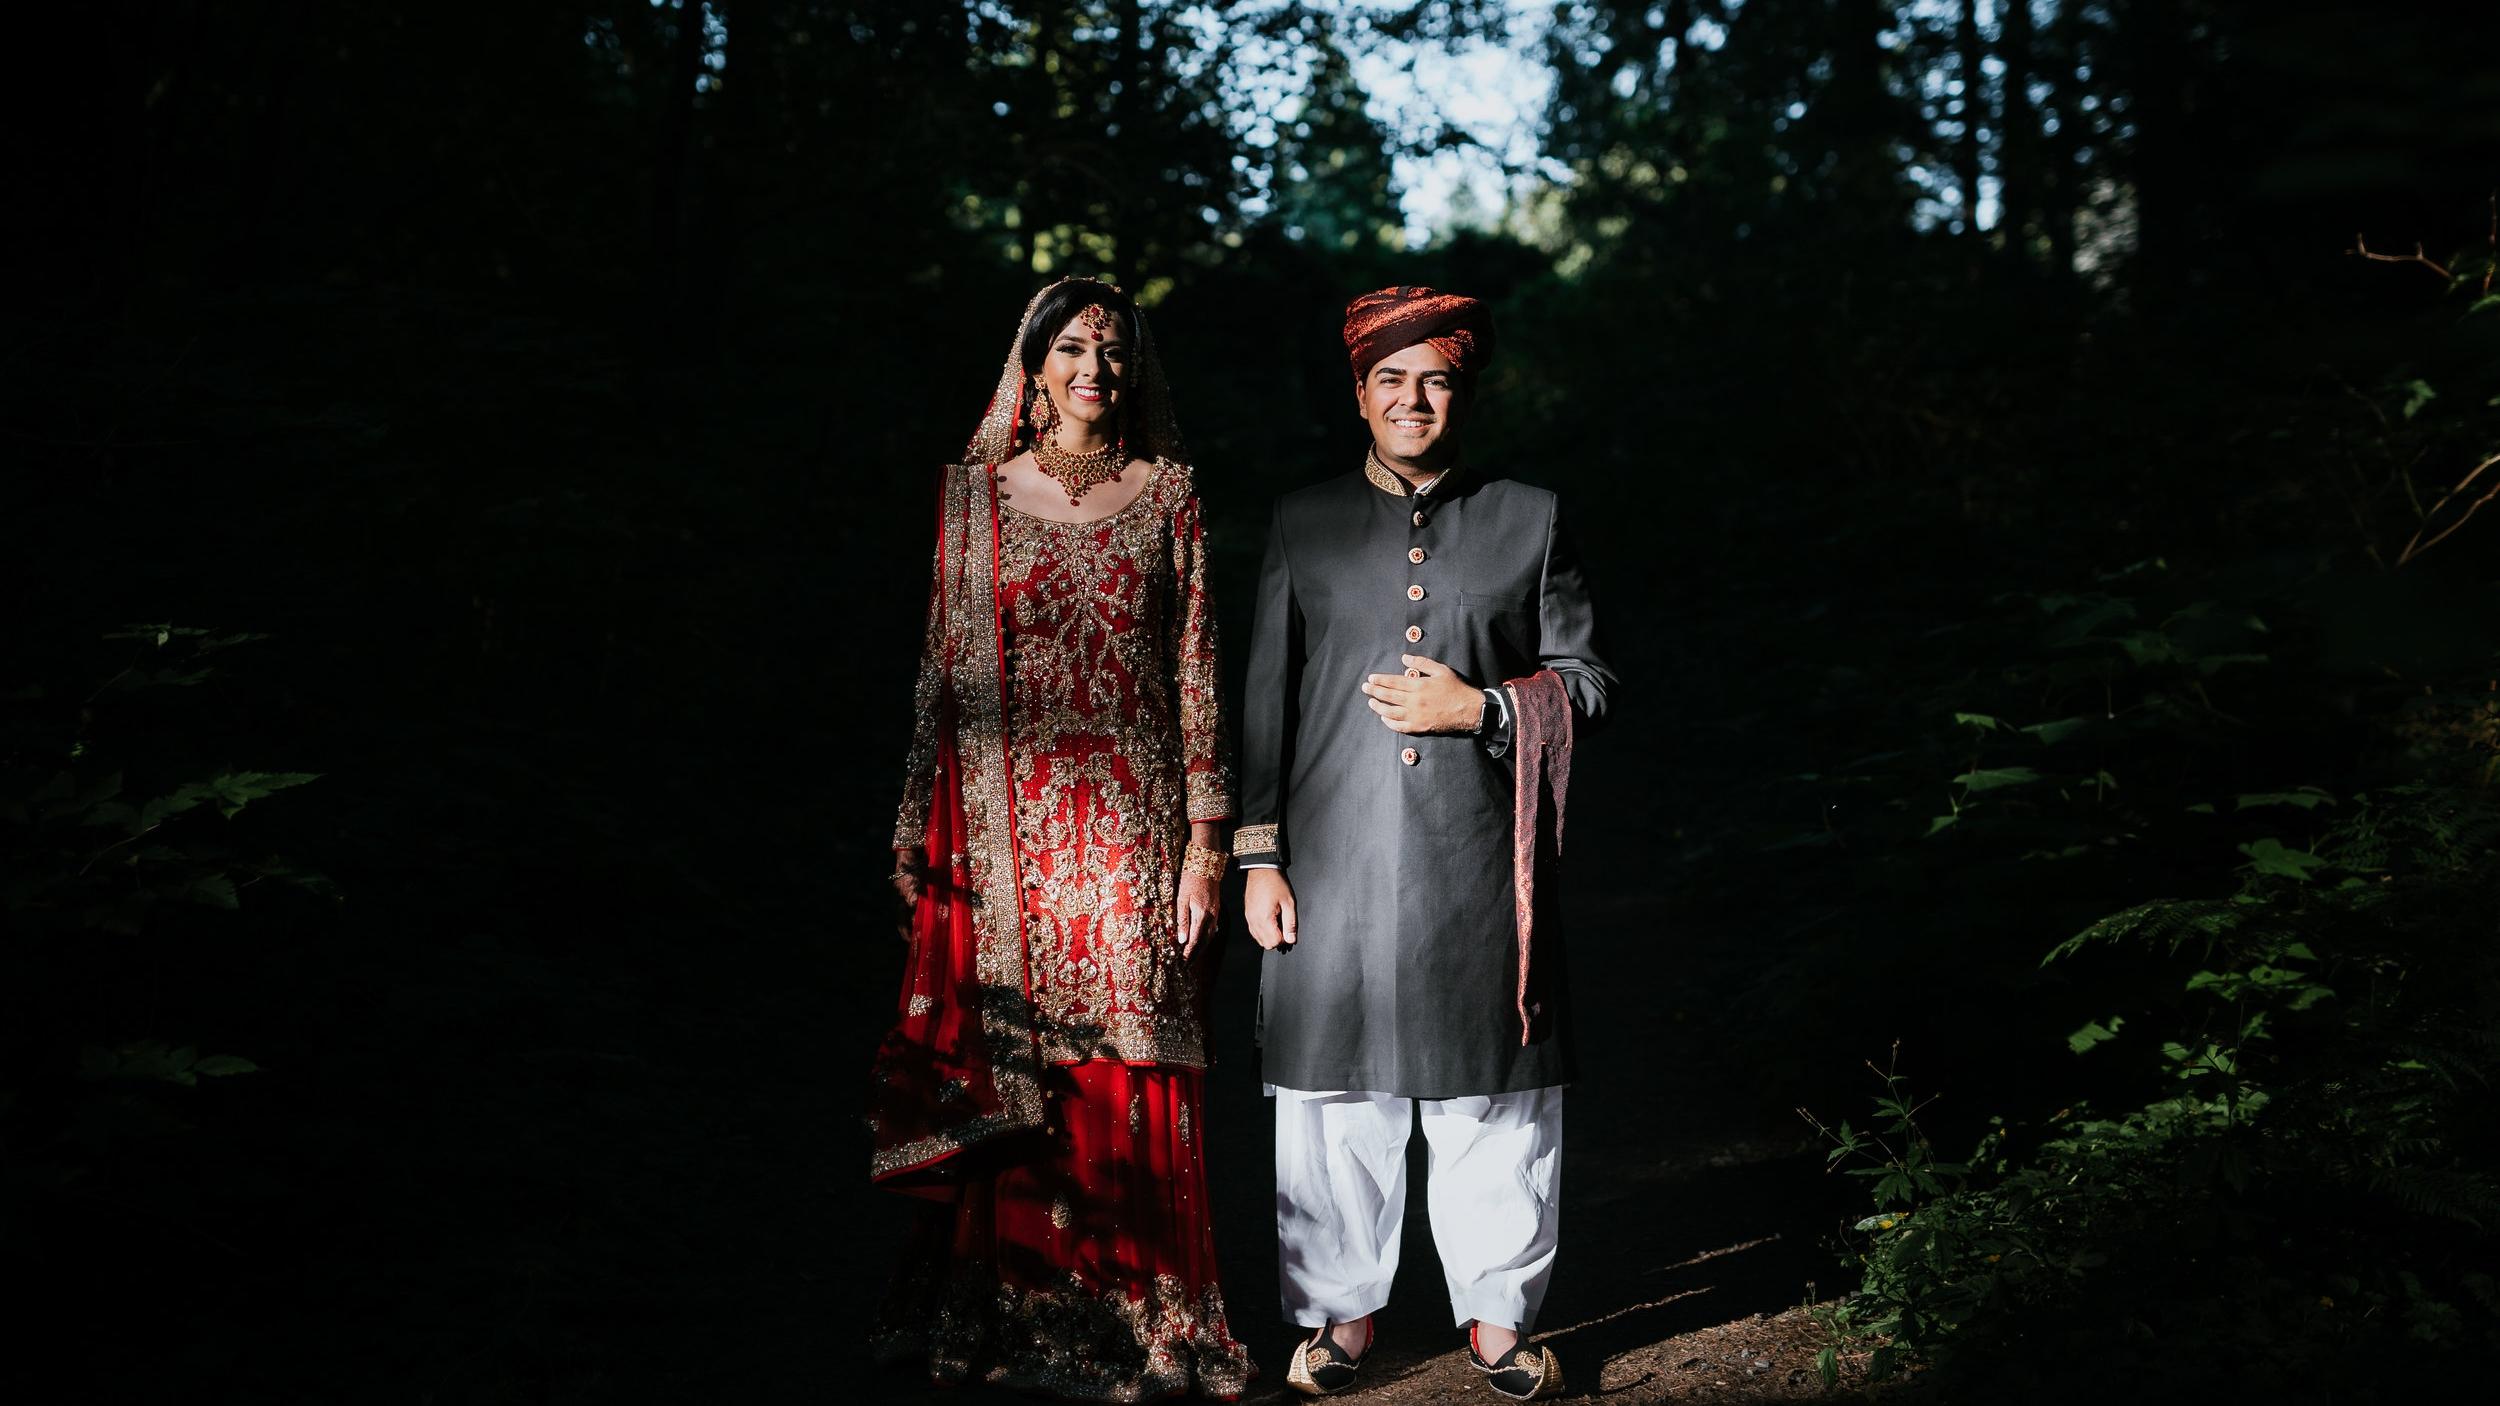 oliver-rabanes-vancouver-surrey-pakistani-wedding-photography.jpg